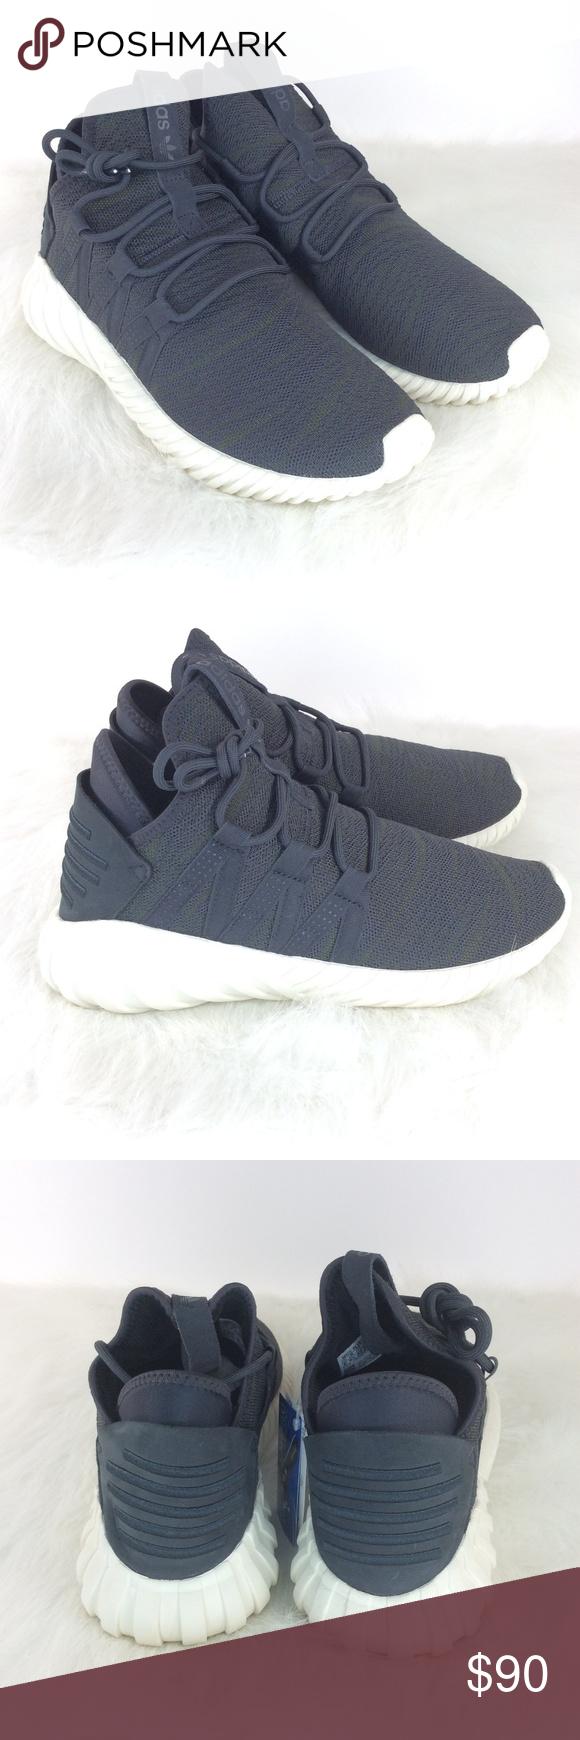 Adidas Tubular Dawn Brand new in box. Runs true to size